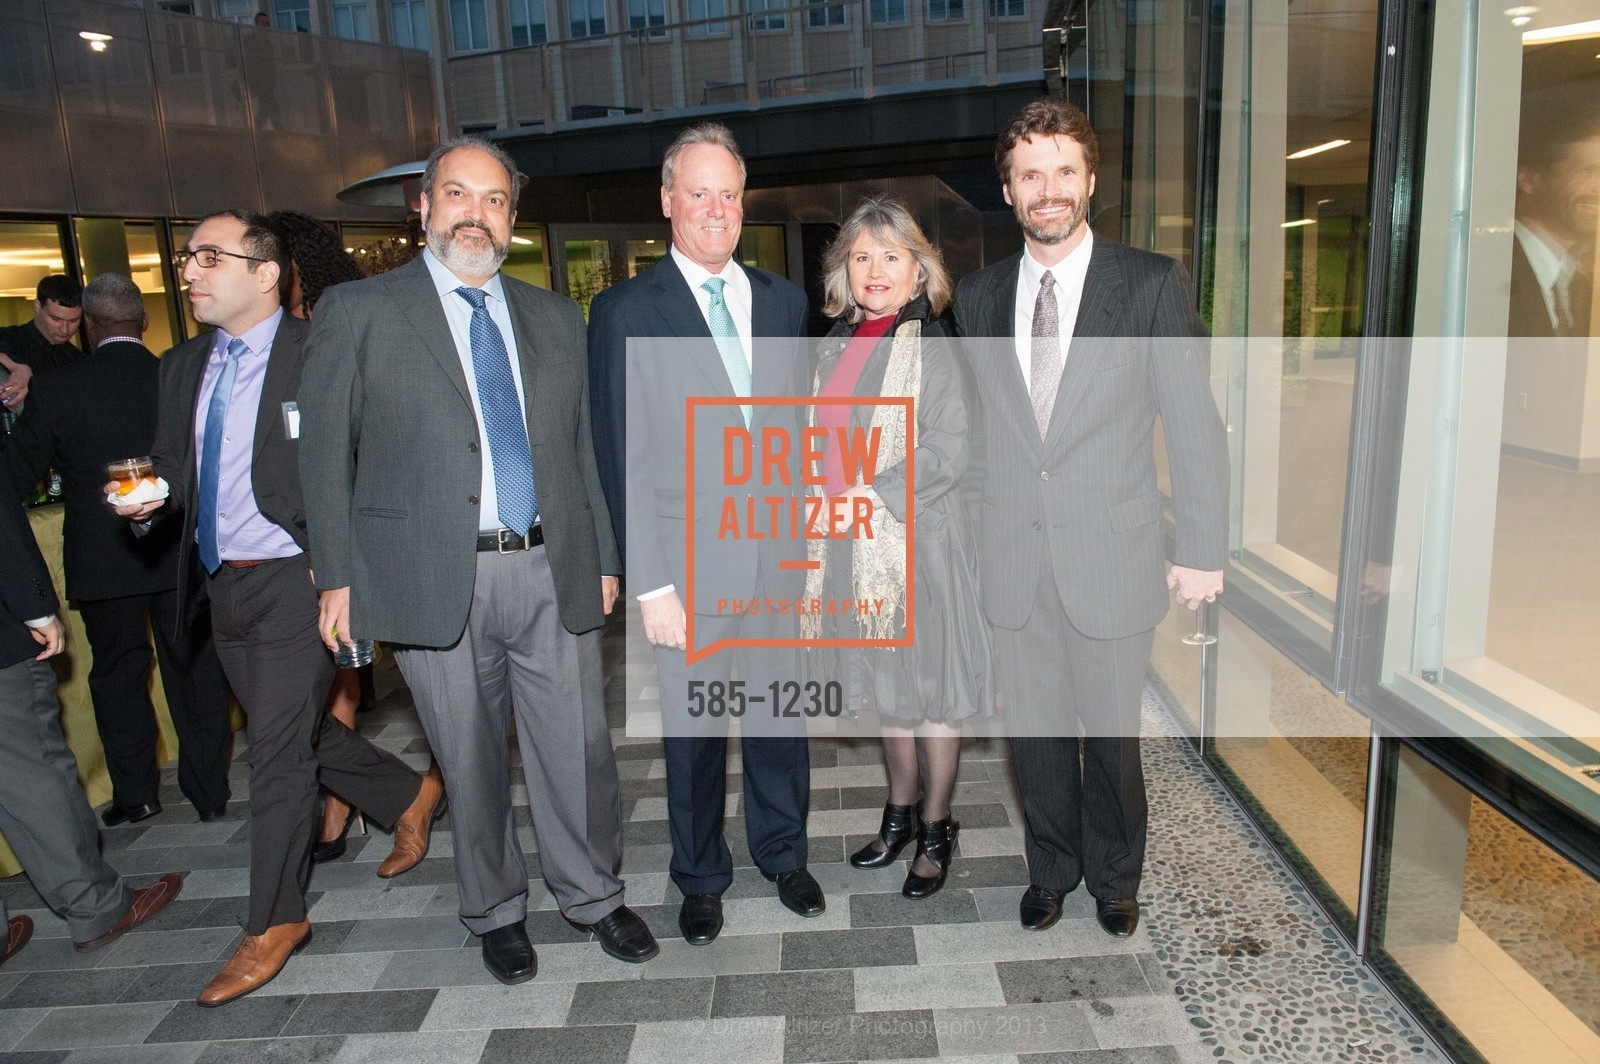 Marcelo Camperi, Charlie Cross, Gayle Ravens Croft, Patrick Murphy, Photo #585-1230